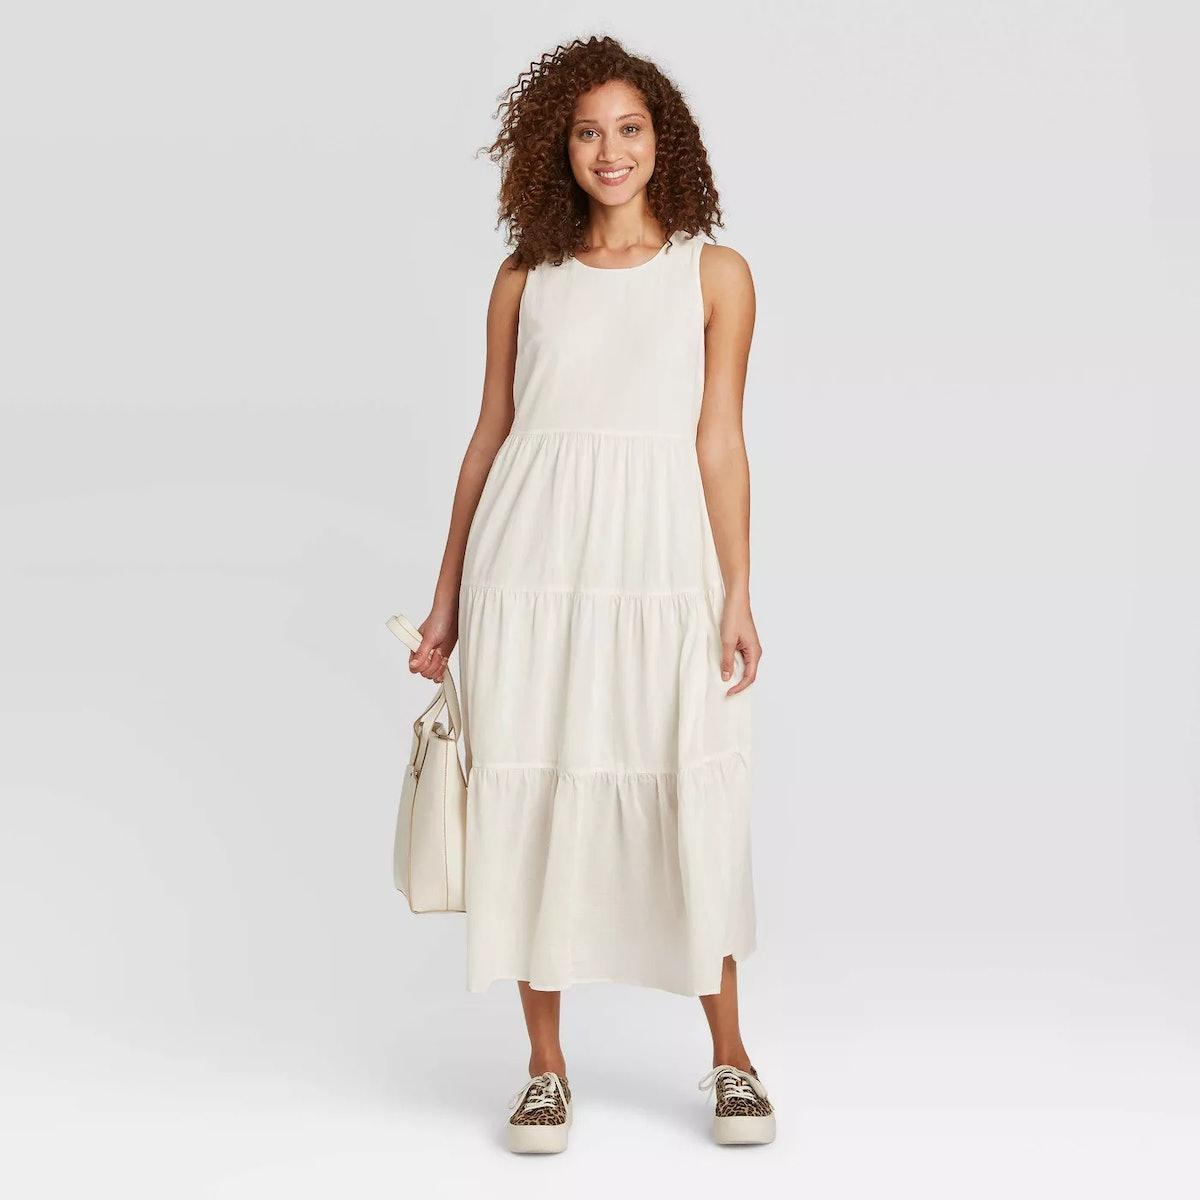 A New Day Women's Sleeveless Tiered Dress